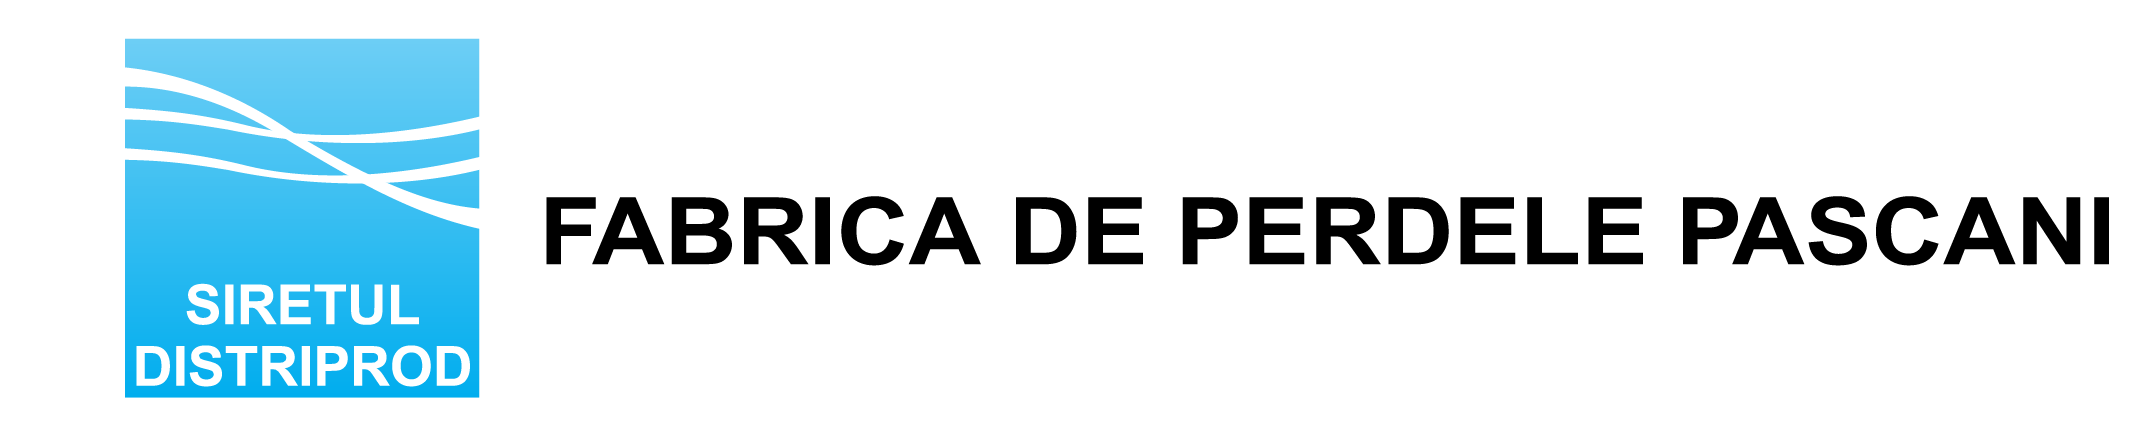 logobunn-01